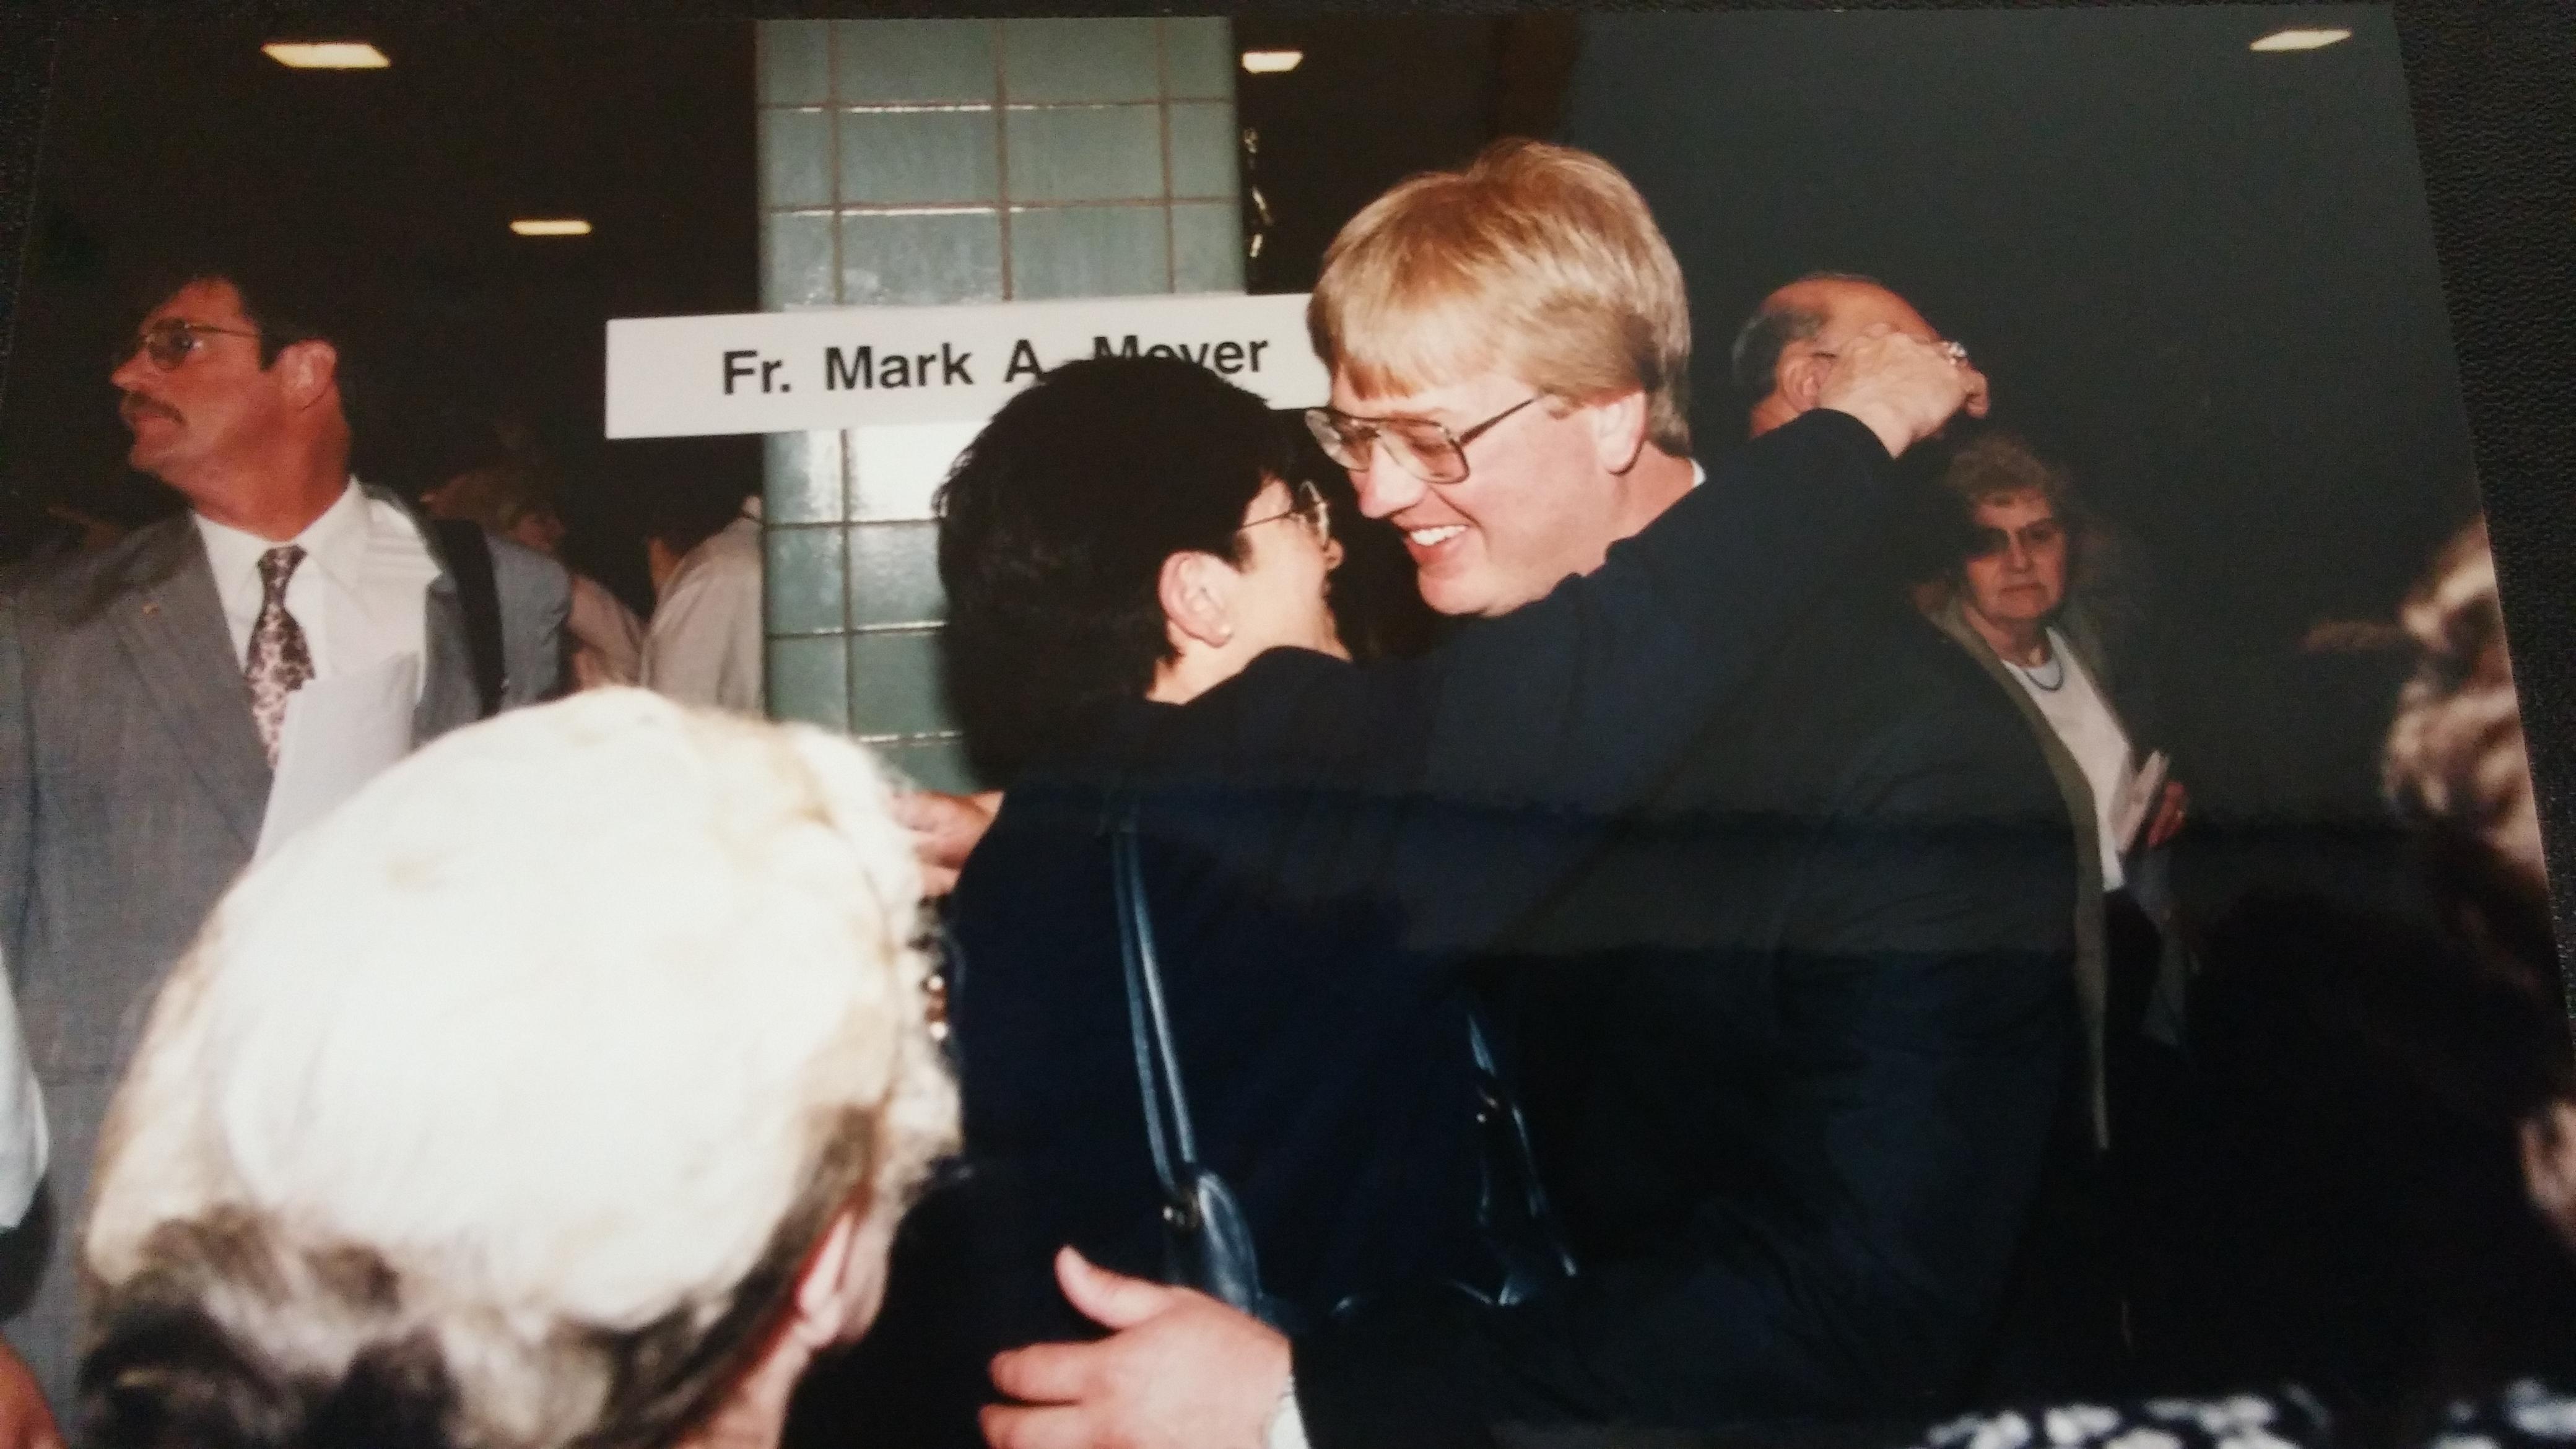 Fr. Mark Meyer receives congratulatory hugs.